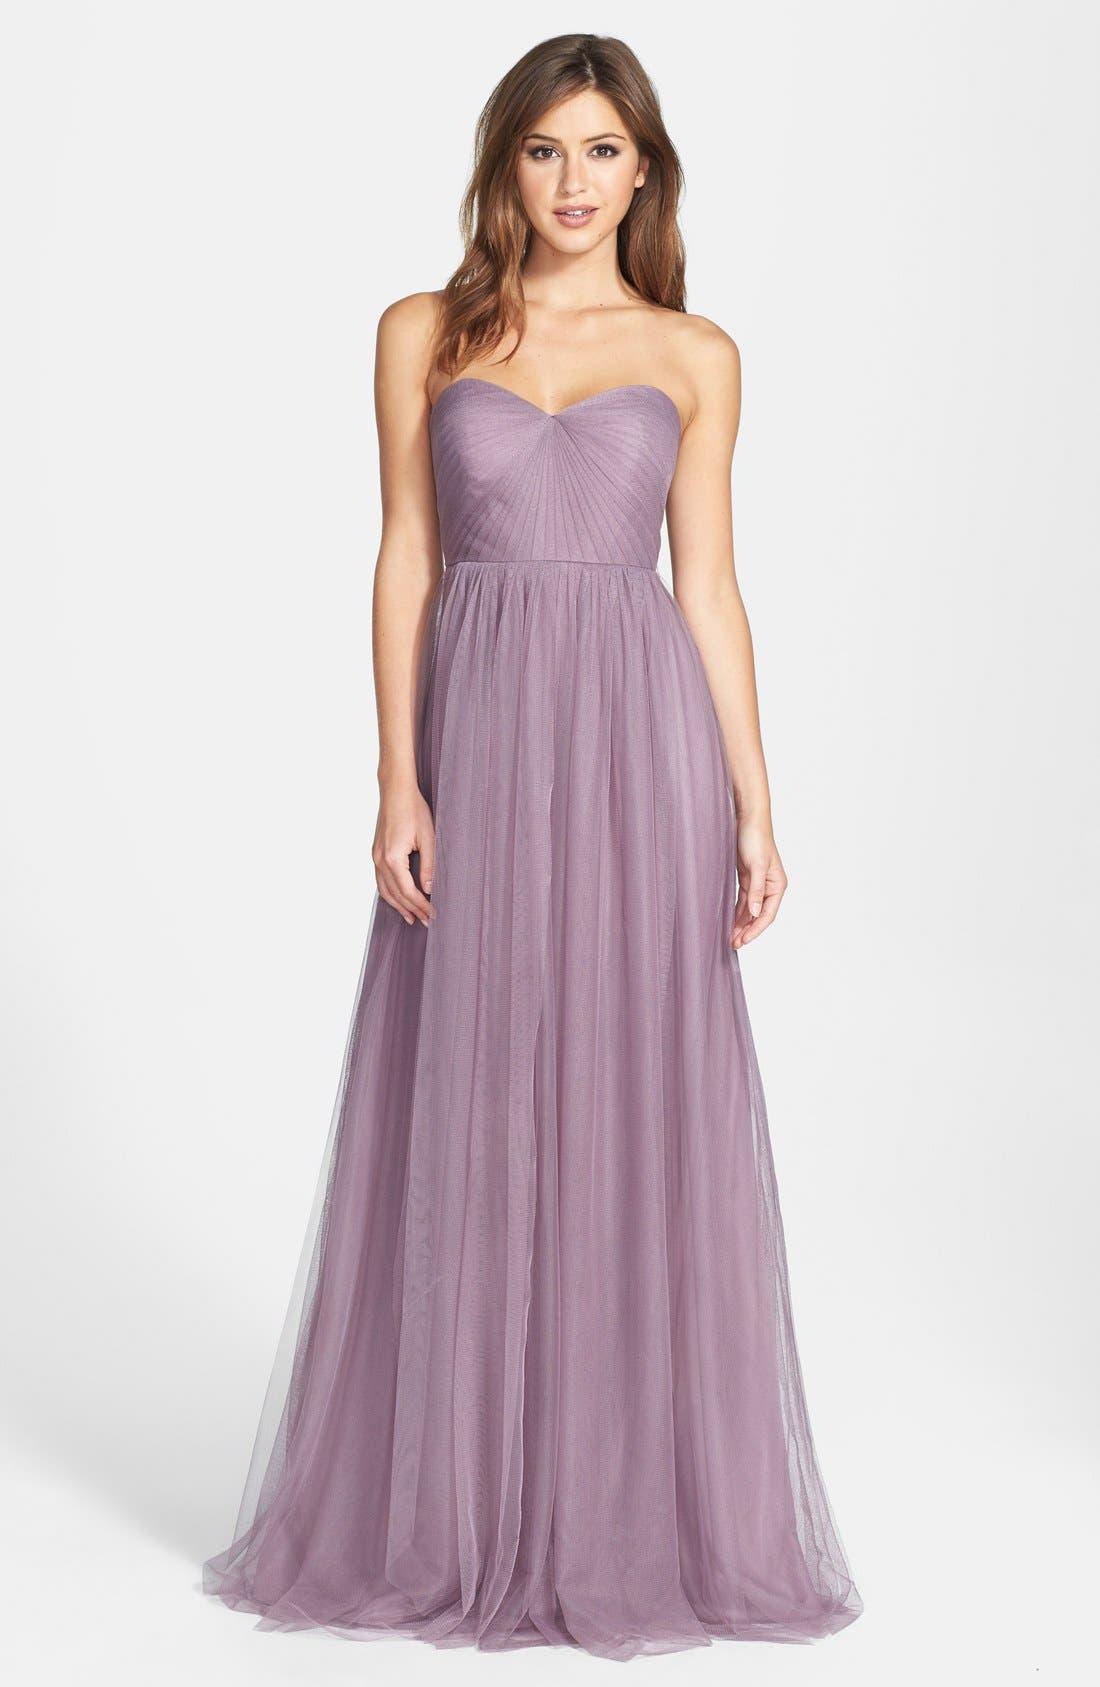 Annabelle Convertible Tulle Column Dress, Lilac